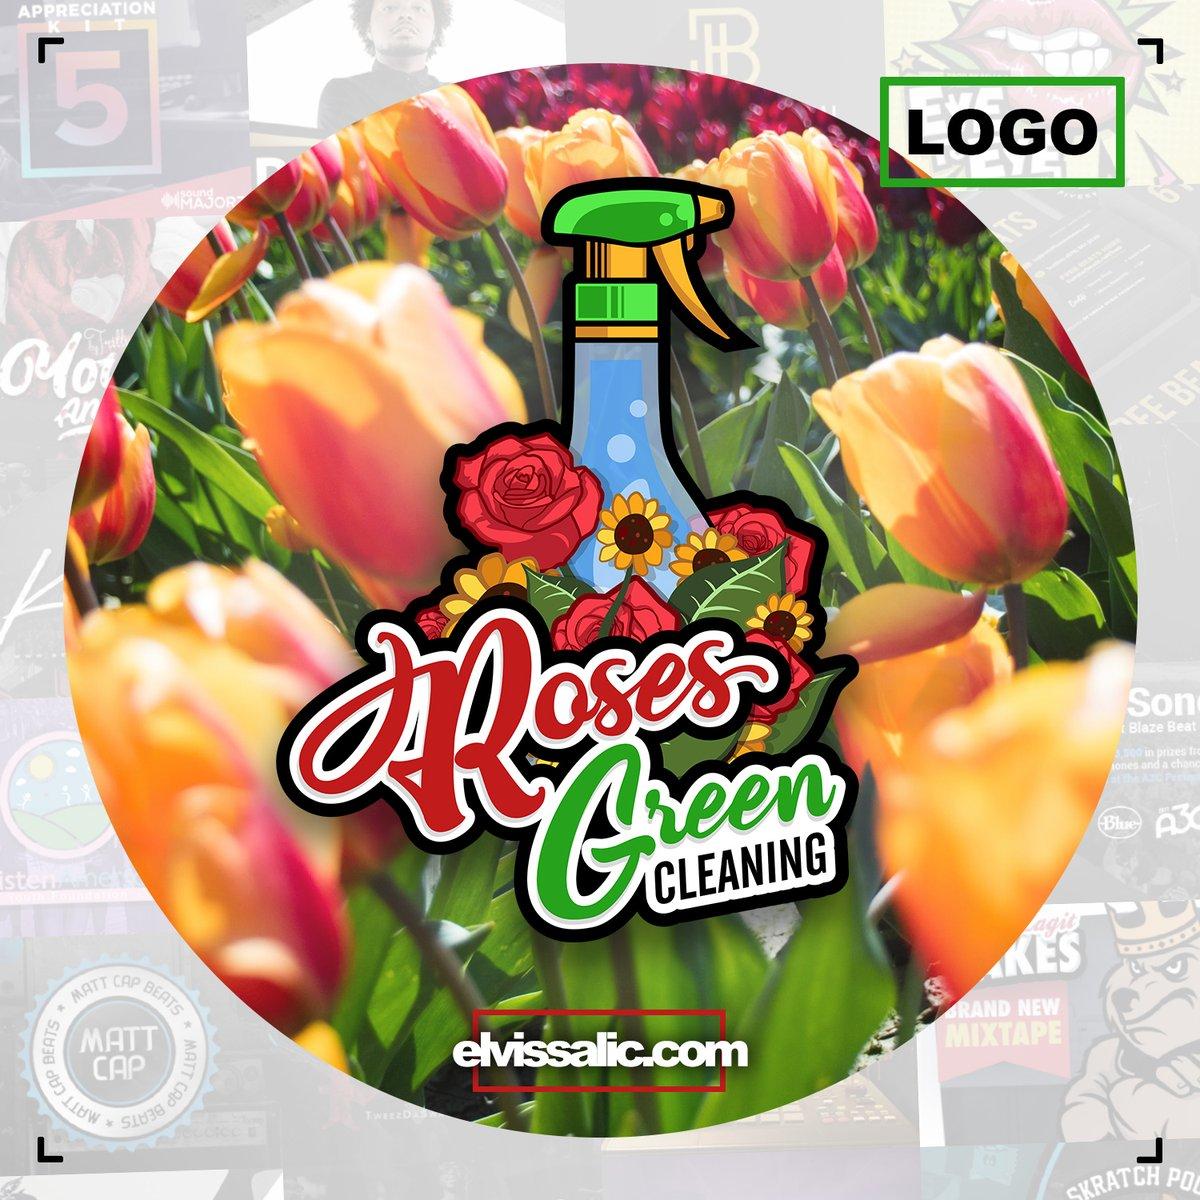 Roses Green Cleaning logo development  #graphic #design #graphicdesign #illustrator #vectordesign #brandingdesign #logooftheday #logoinspiration #logodesigner #logocreation #photoshop #illustratordesign #designoftheday #businesslogo #cleaningcompany #identitydesign #cleaning https://t.co/c0frv2bREr